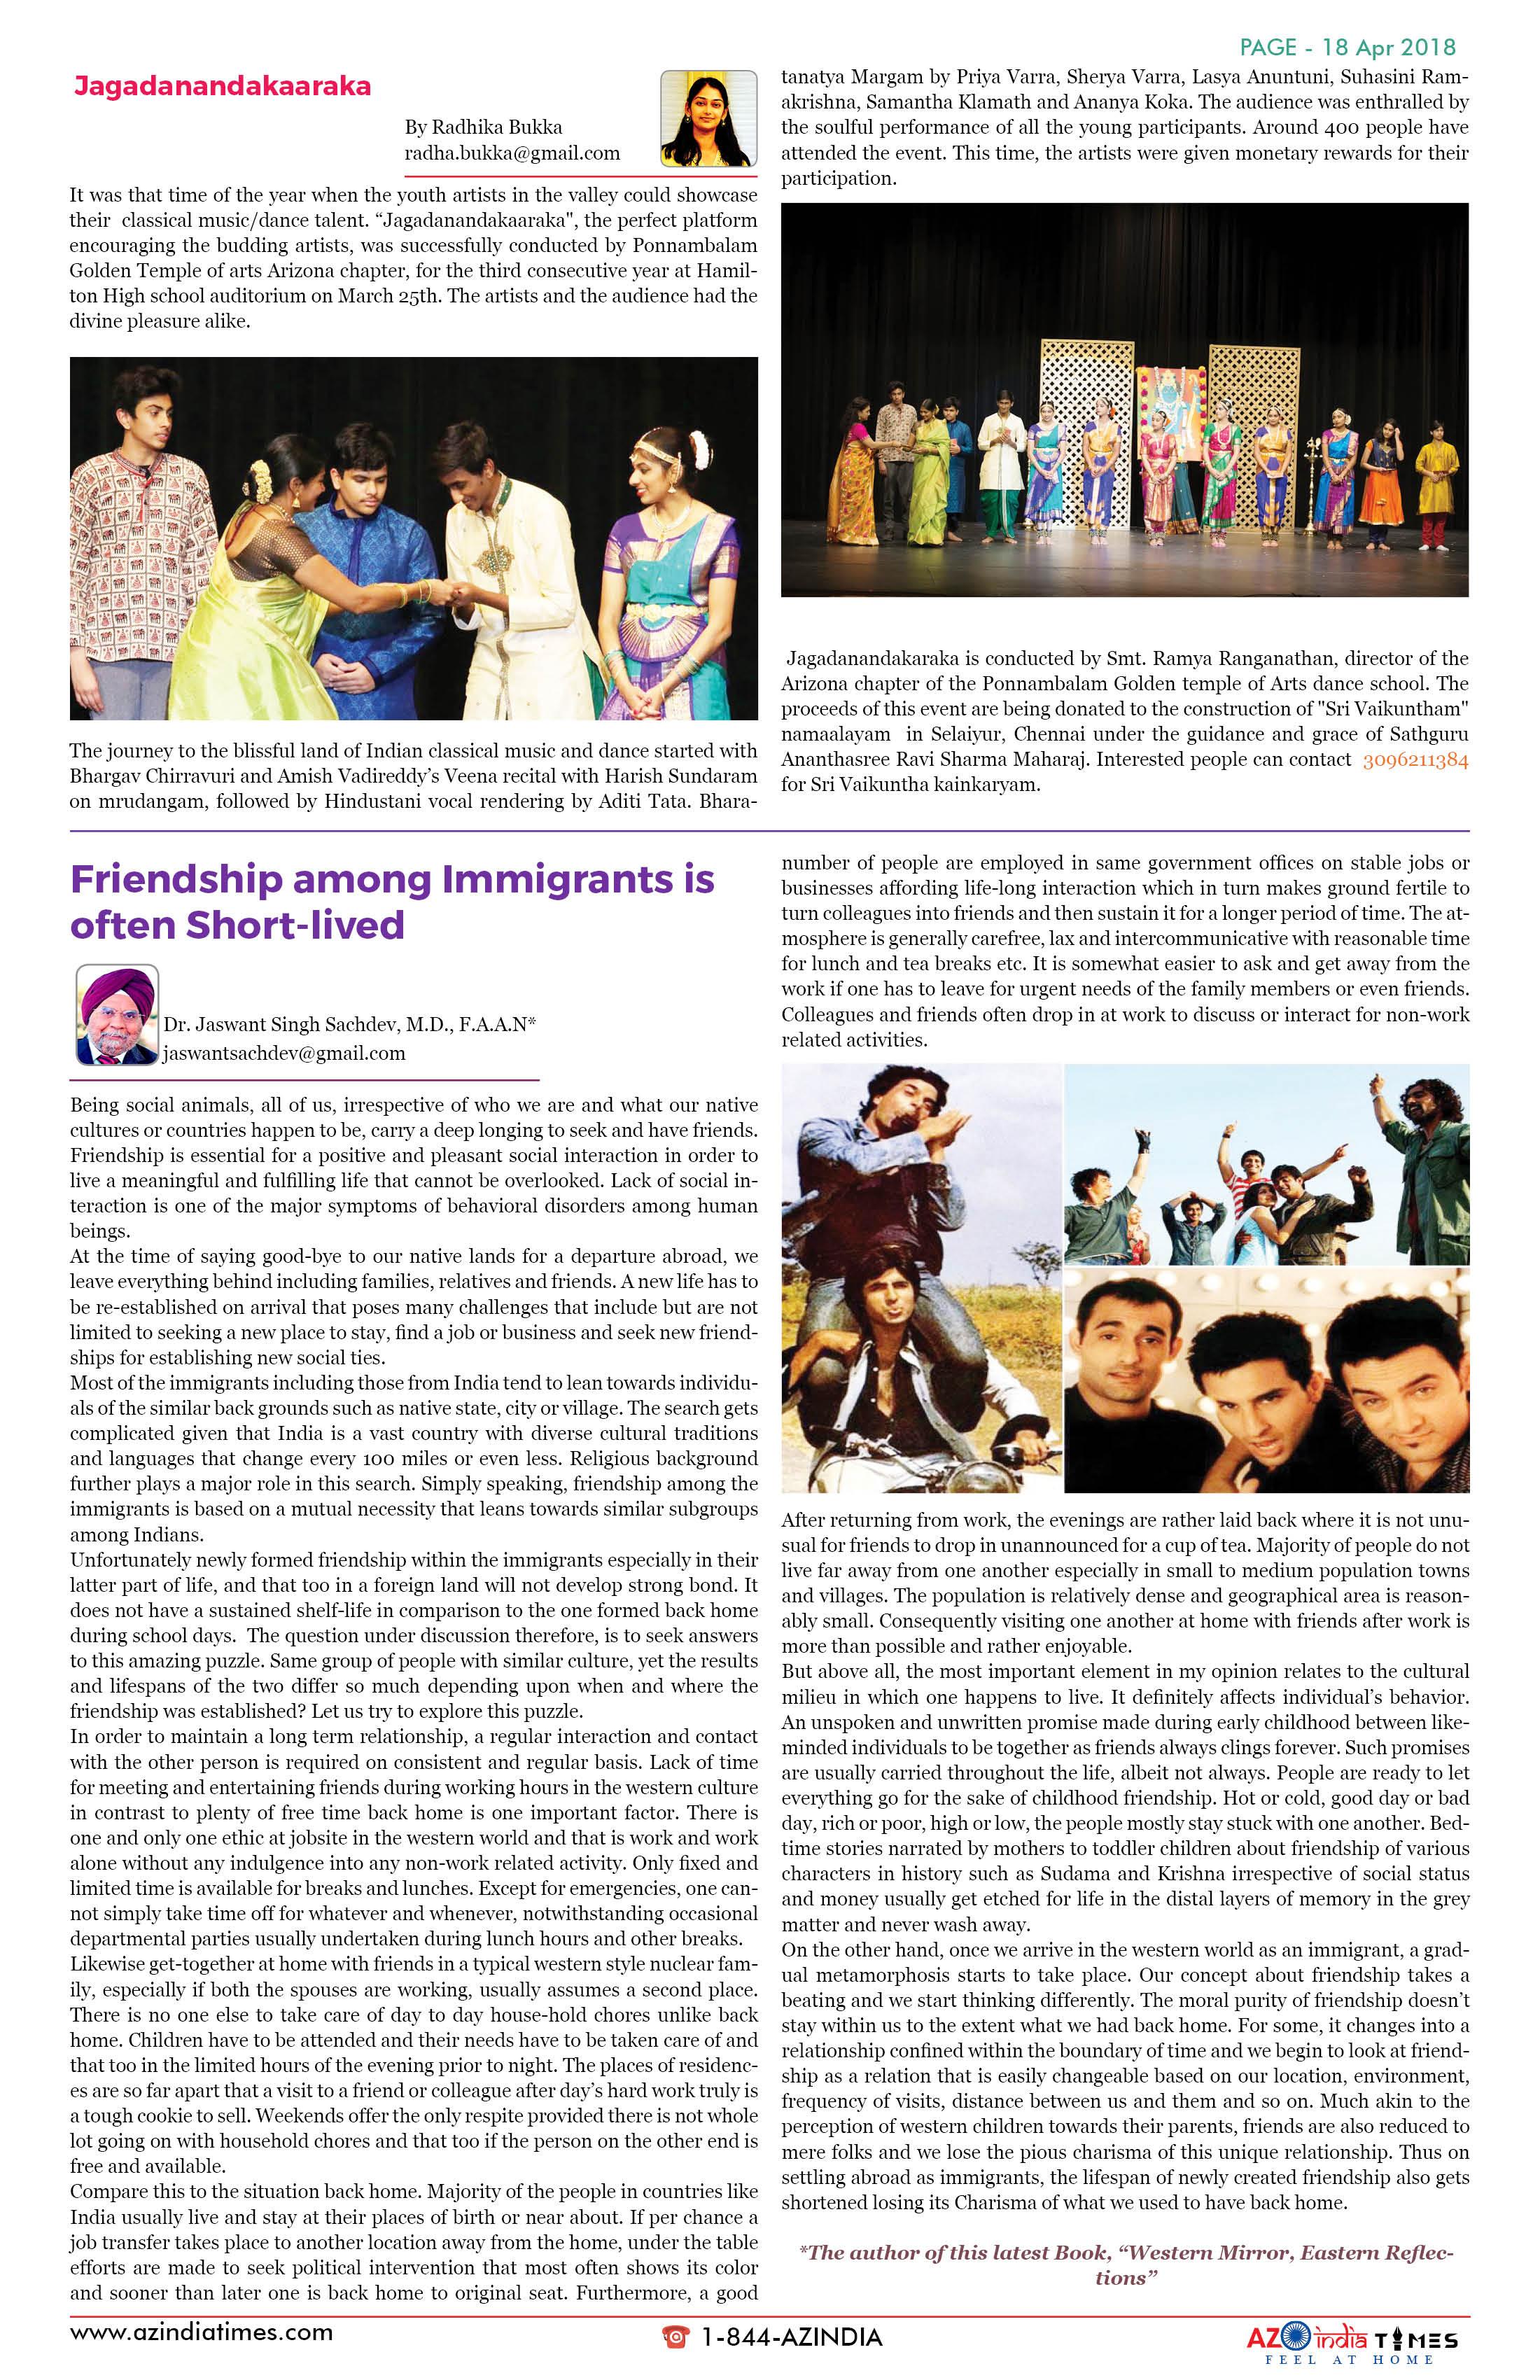 AZ INDIA APRIL EDITION 18